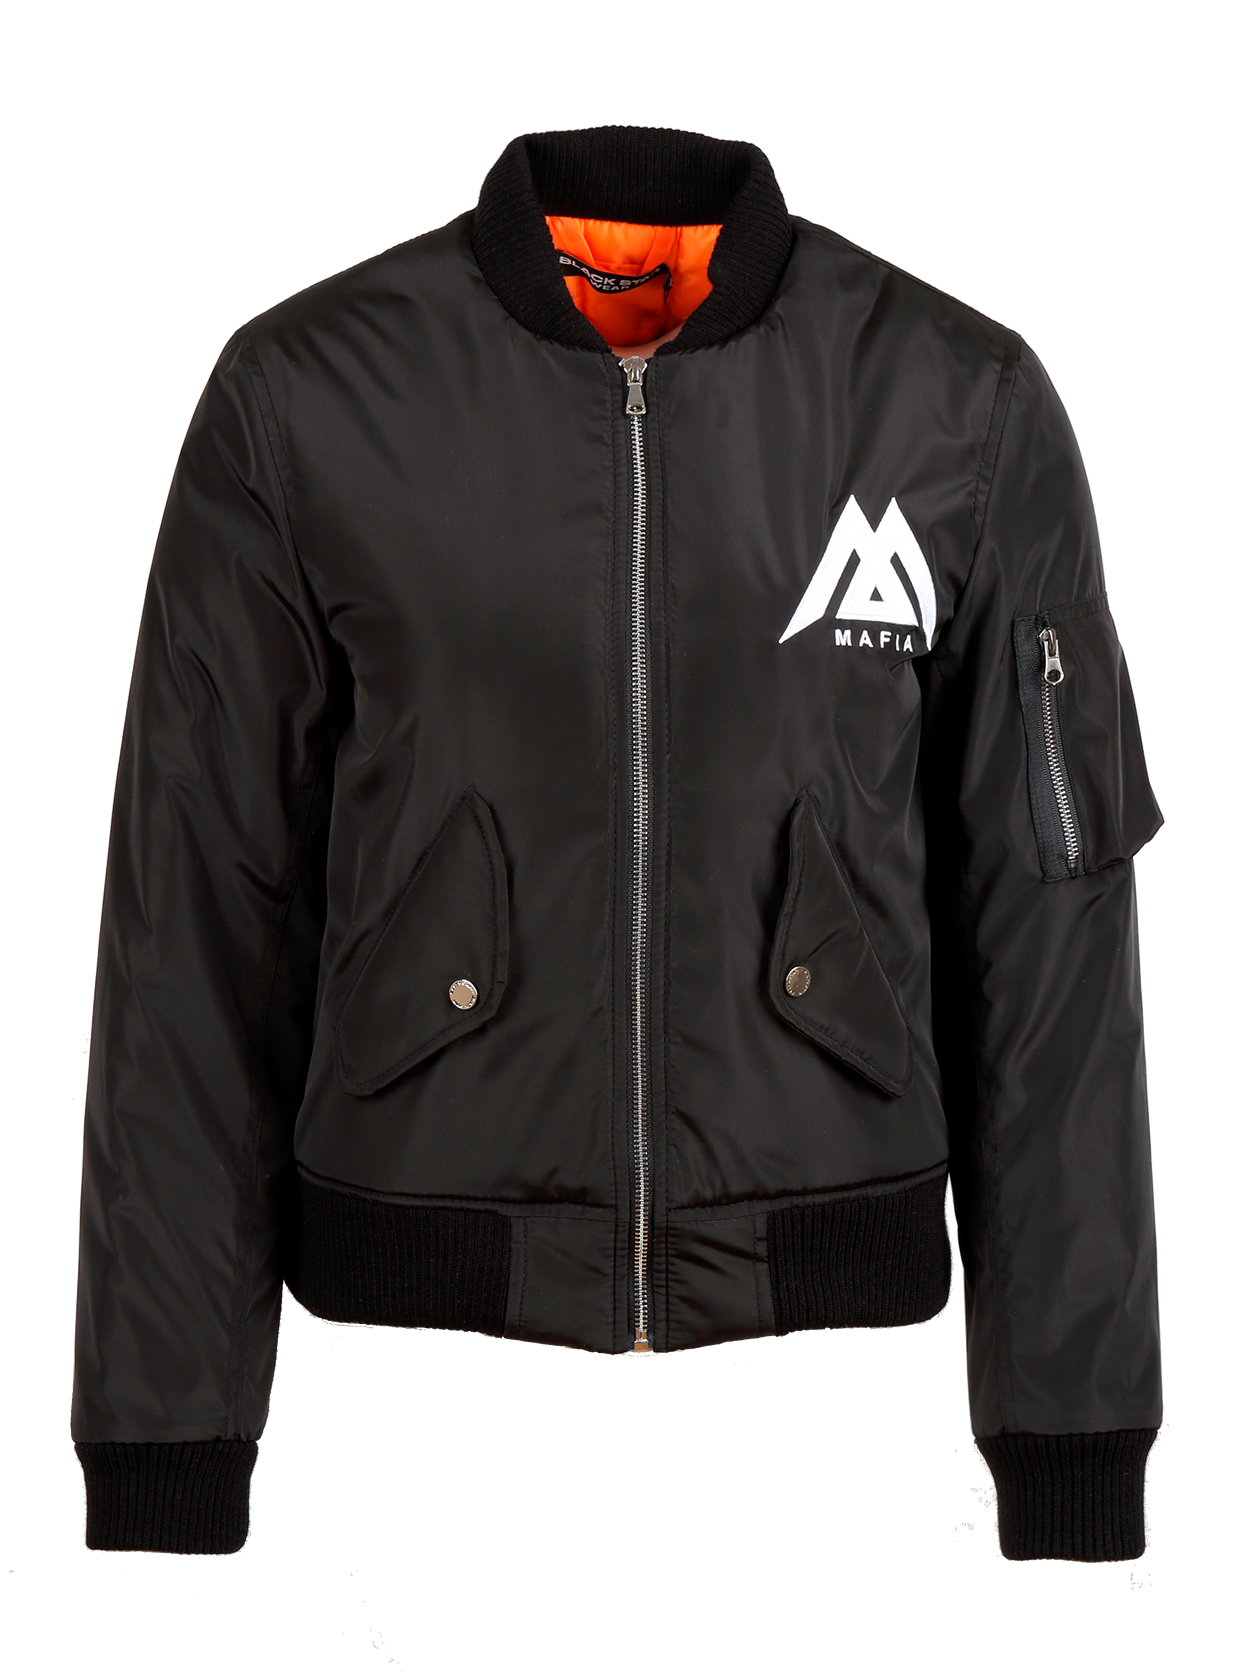 Куртка-бомбер женская Black Star Mafia от Black Star Wear